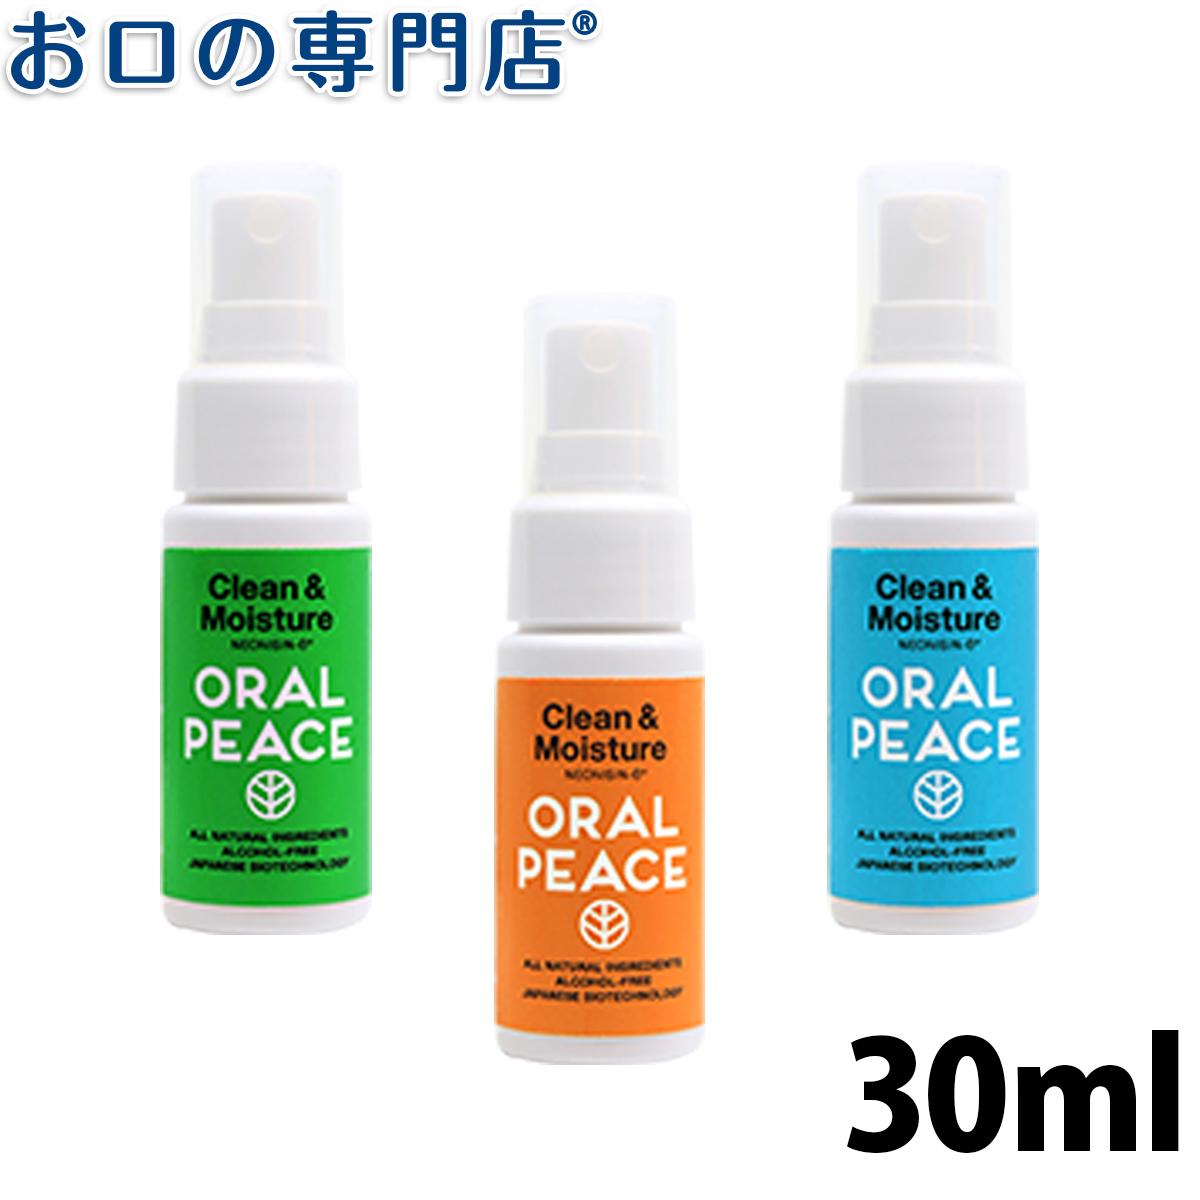 ORAL PEACE MOUTH SPRAY & WASH 30ML